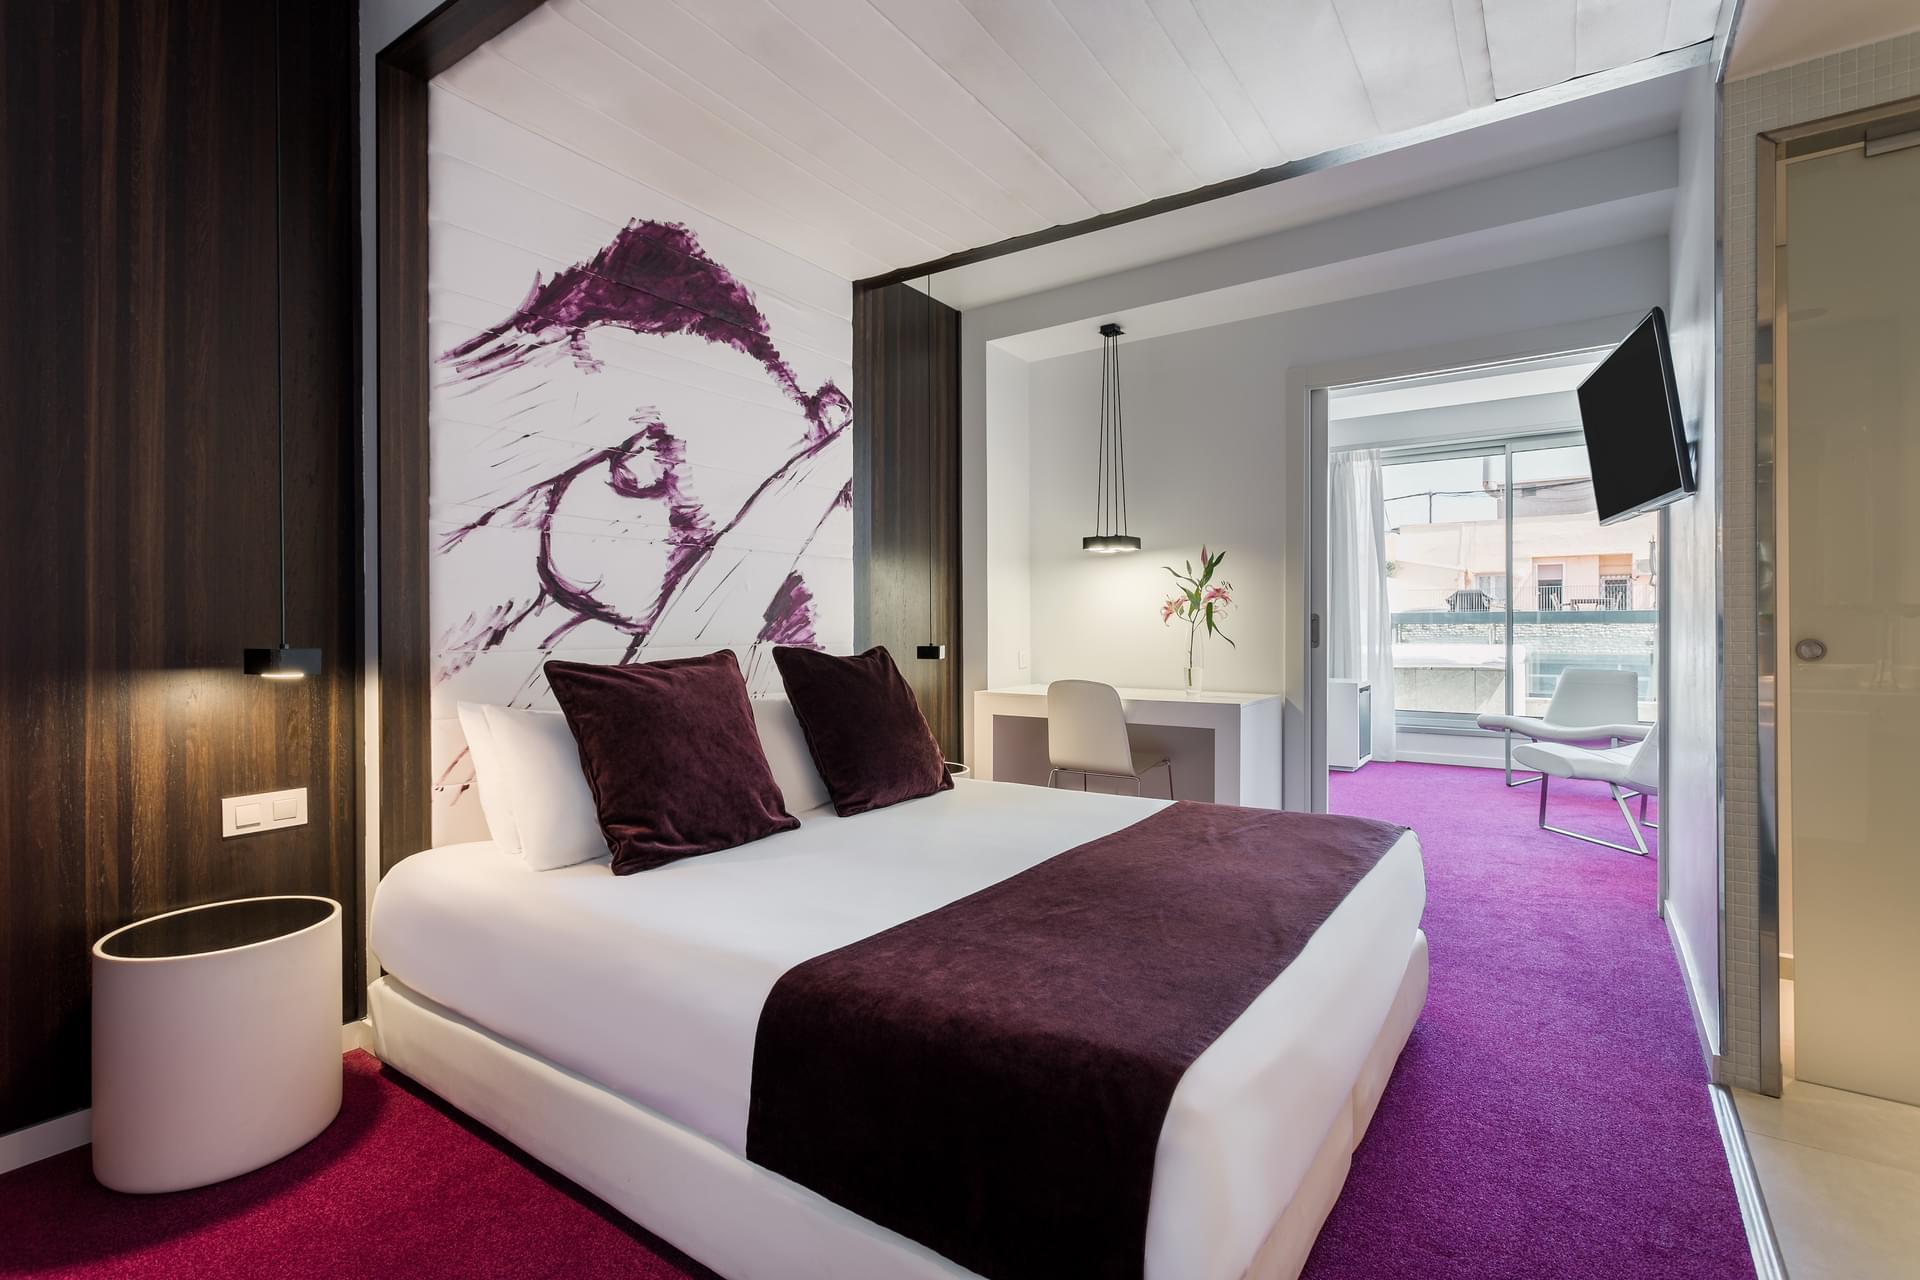 Photo gallery boutique hotel room mate emma - Matelas dunlopillo trendy room 24 ...